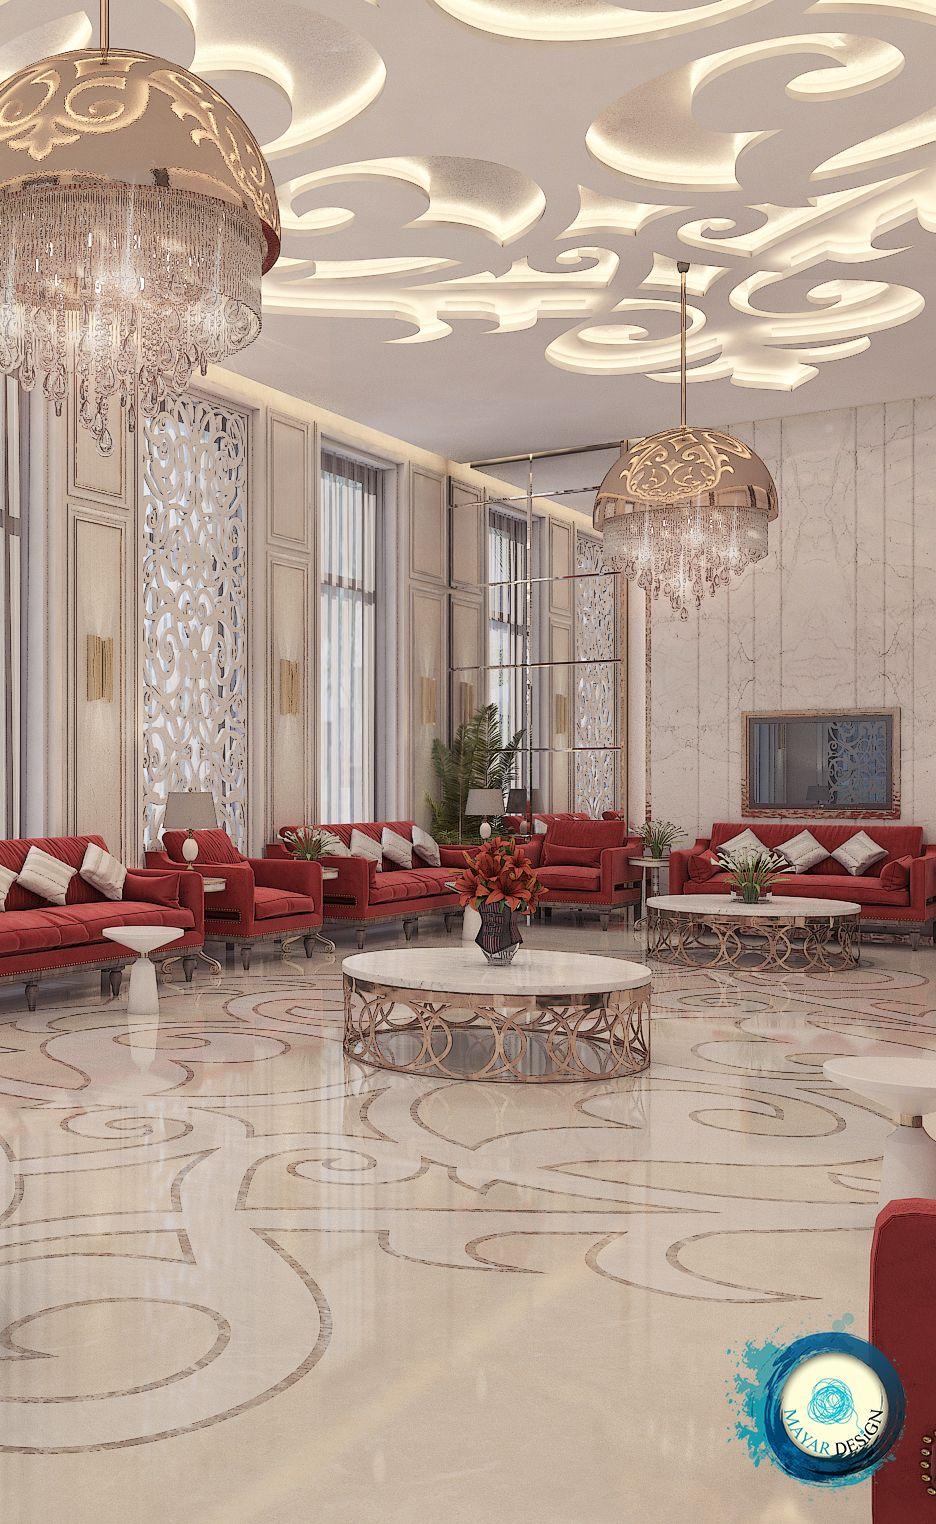 Majles In Dubai Ceiling Design Modern Ceiling Design Ceiling